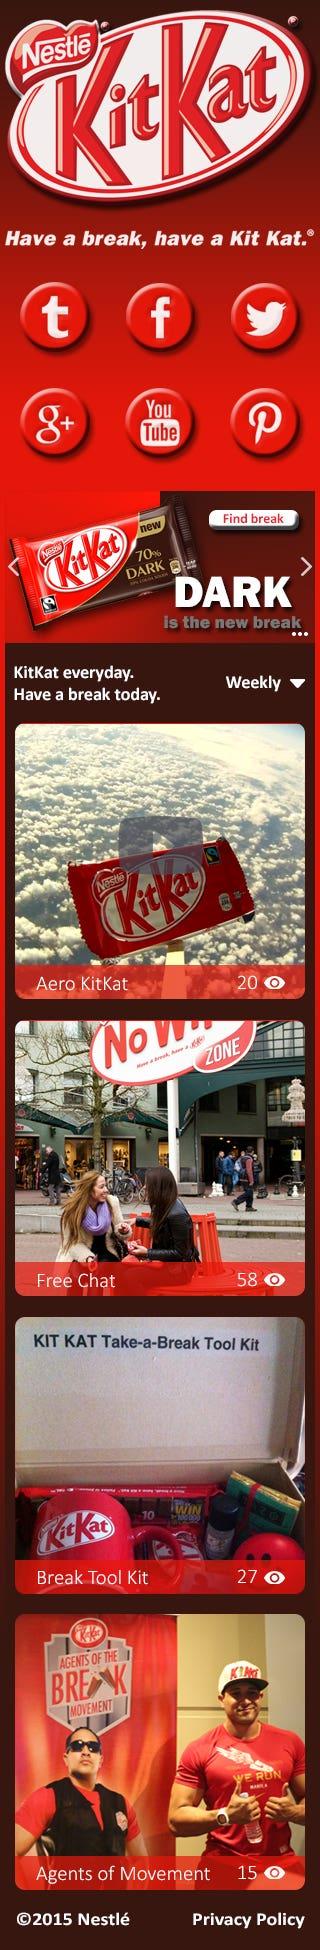 KitKat redesign responsive website